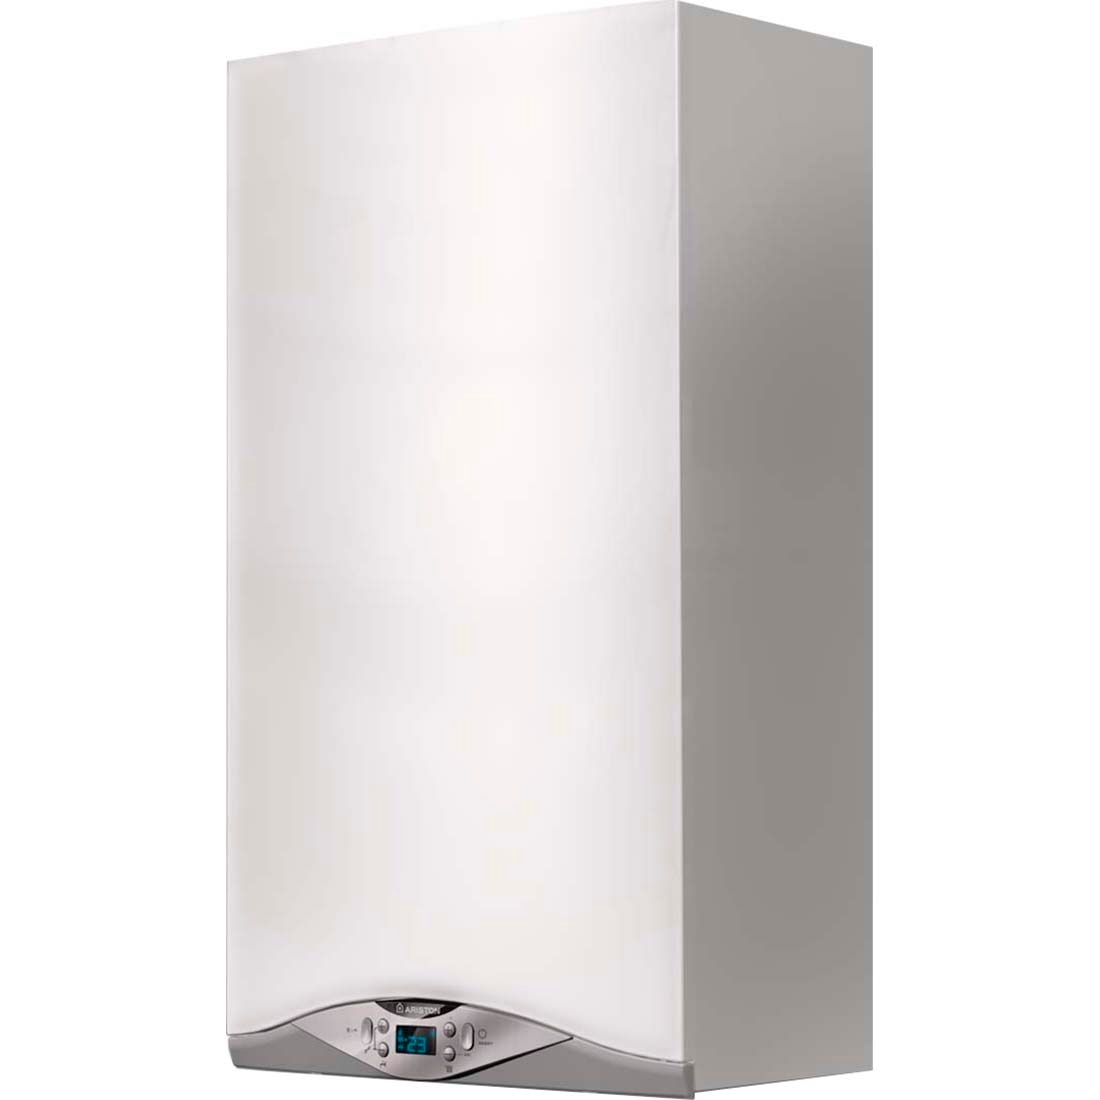 Fotografie Centrala termica murala in condensare Ariston Cares Premium 30 EU, Gaz, Tiraj fortat, 30 kW, Doua schimbatoare de caldura, Display digital, fara kit inclus